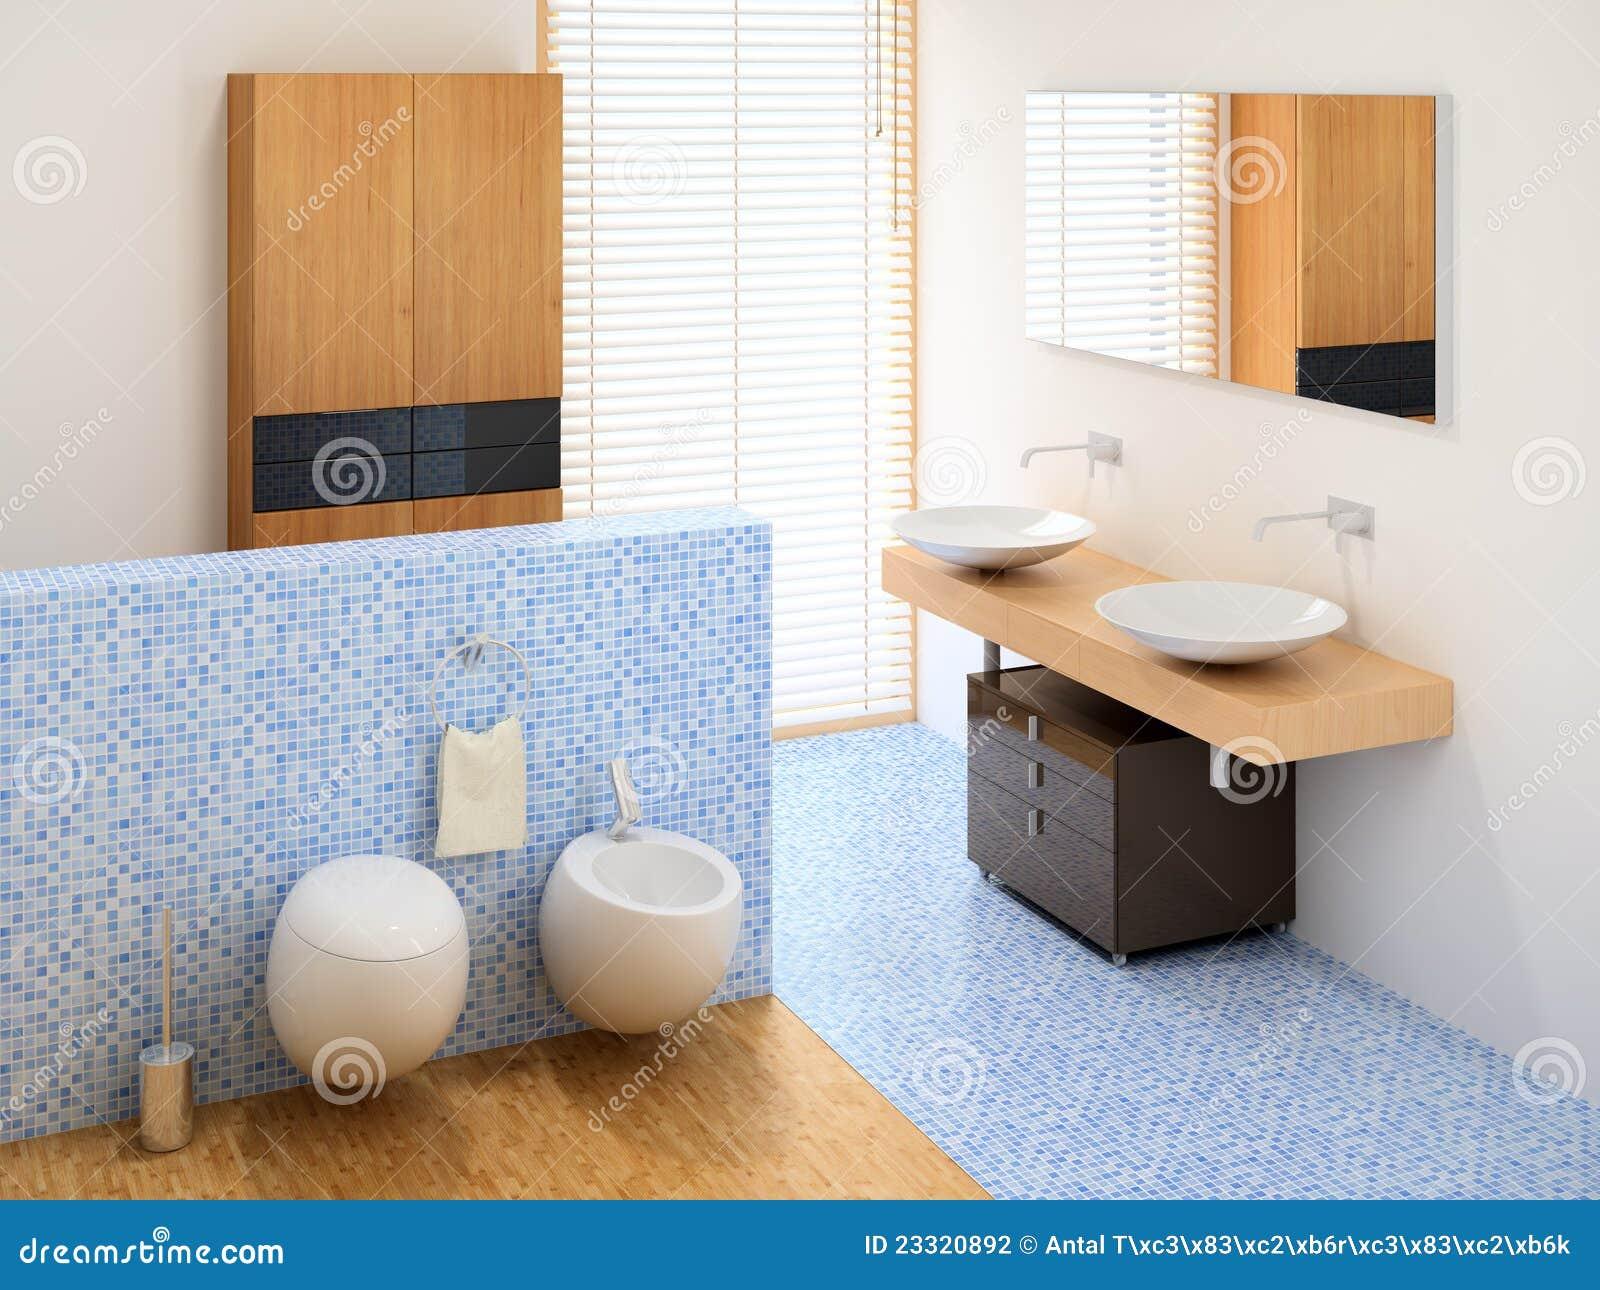 Nieuwe kleine badkamers stock fotografie afbeelding 23320892 - Badkamers ...